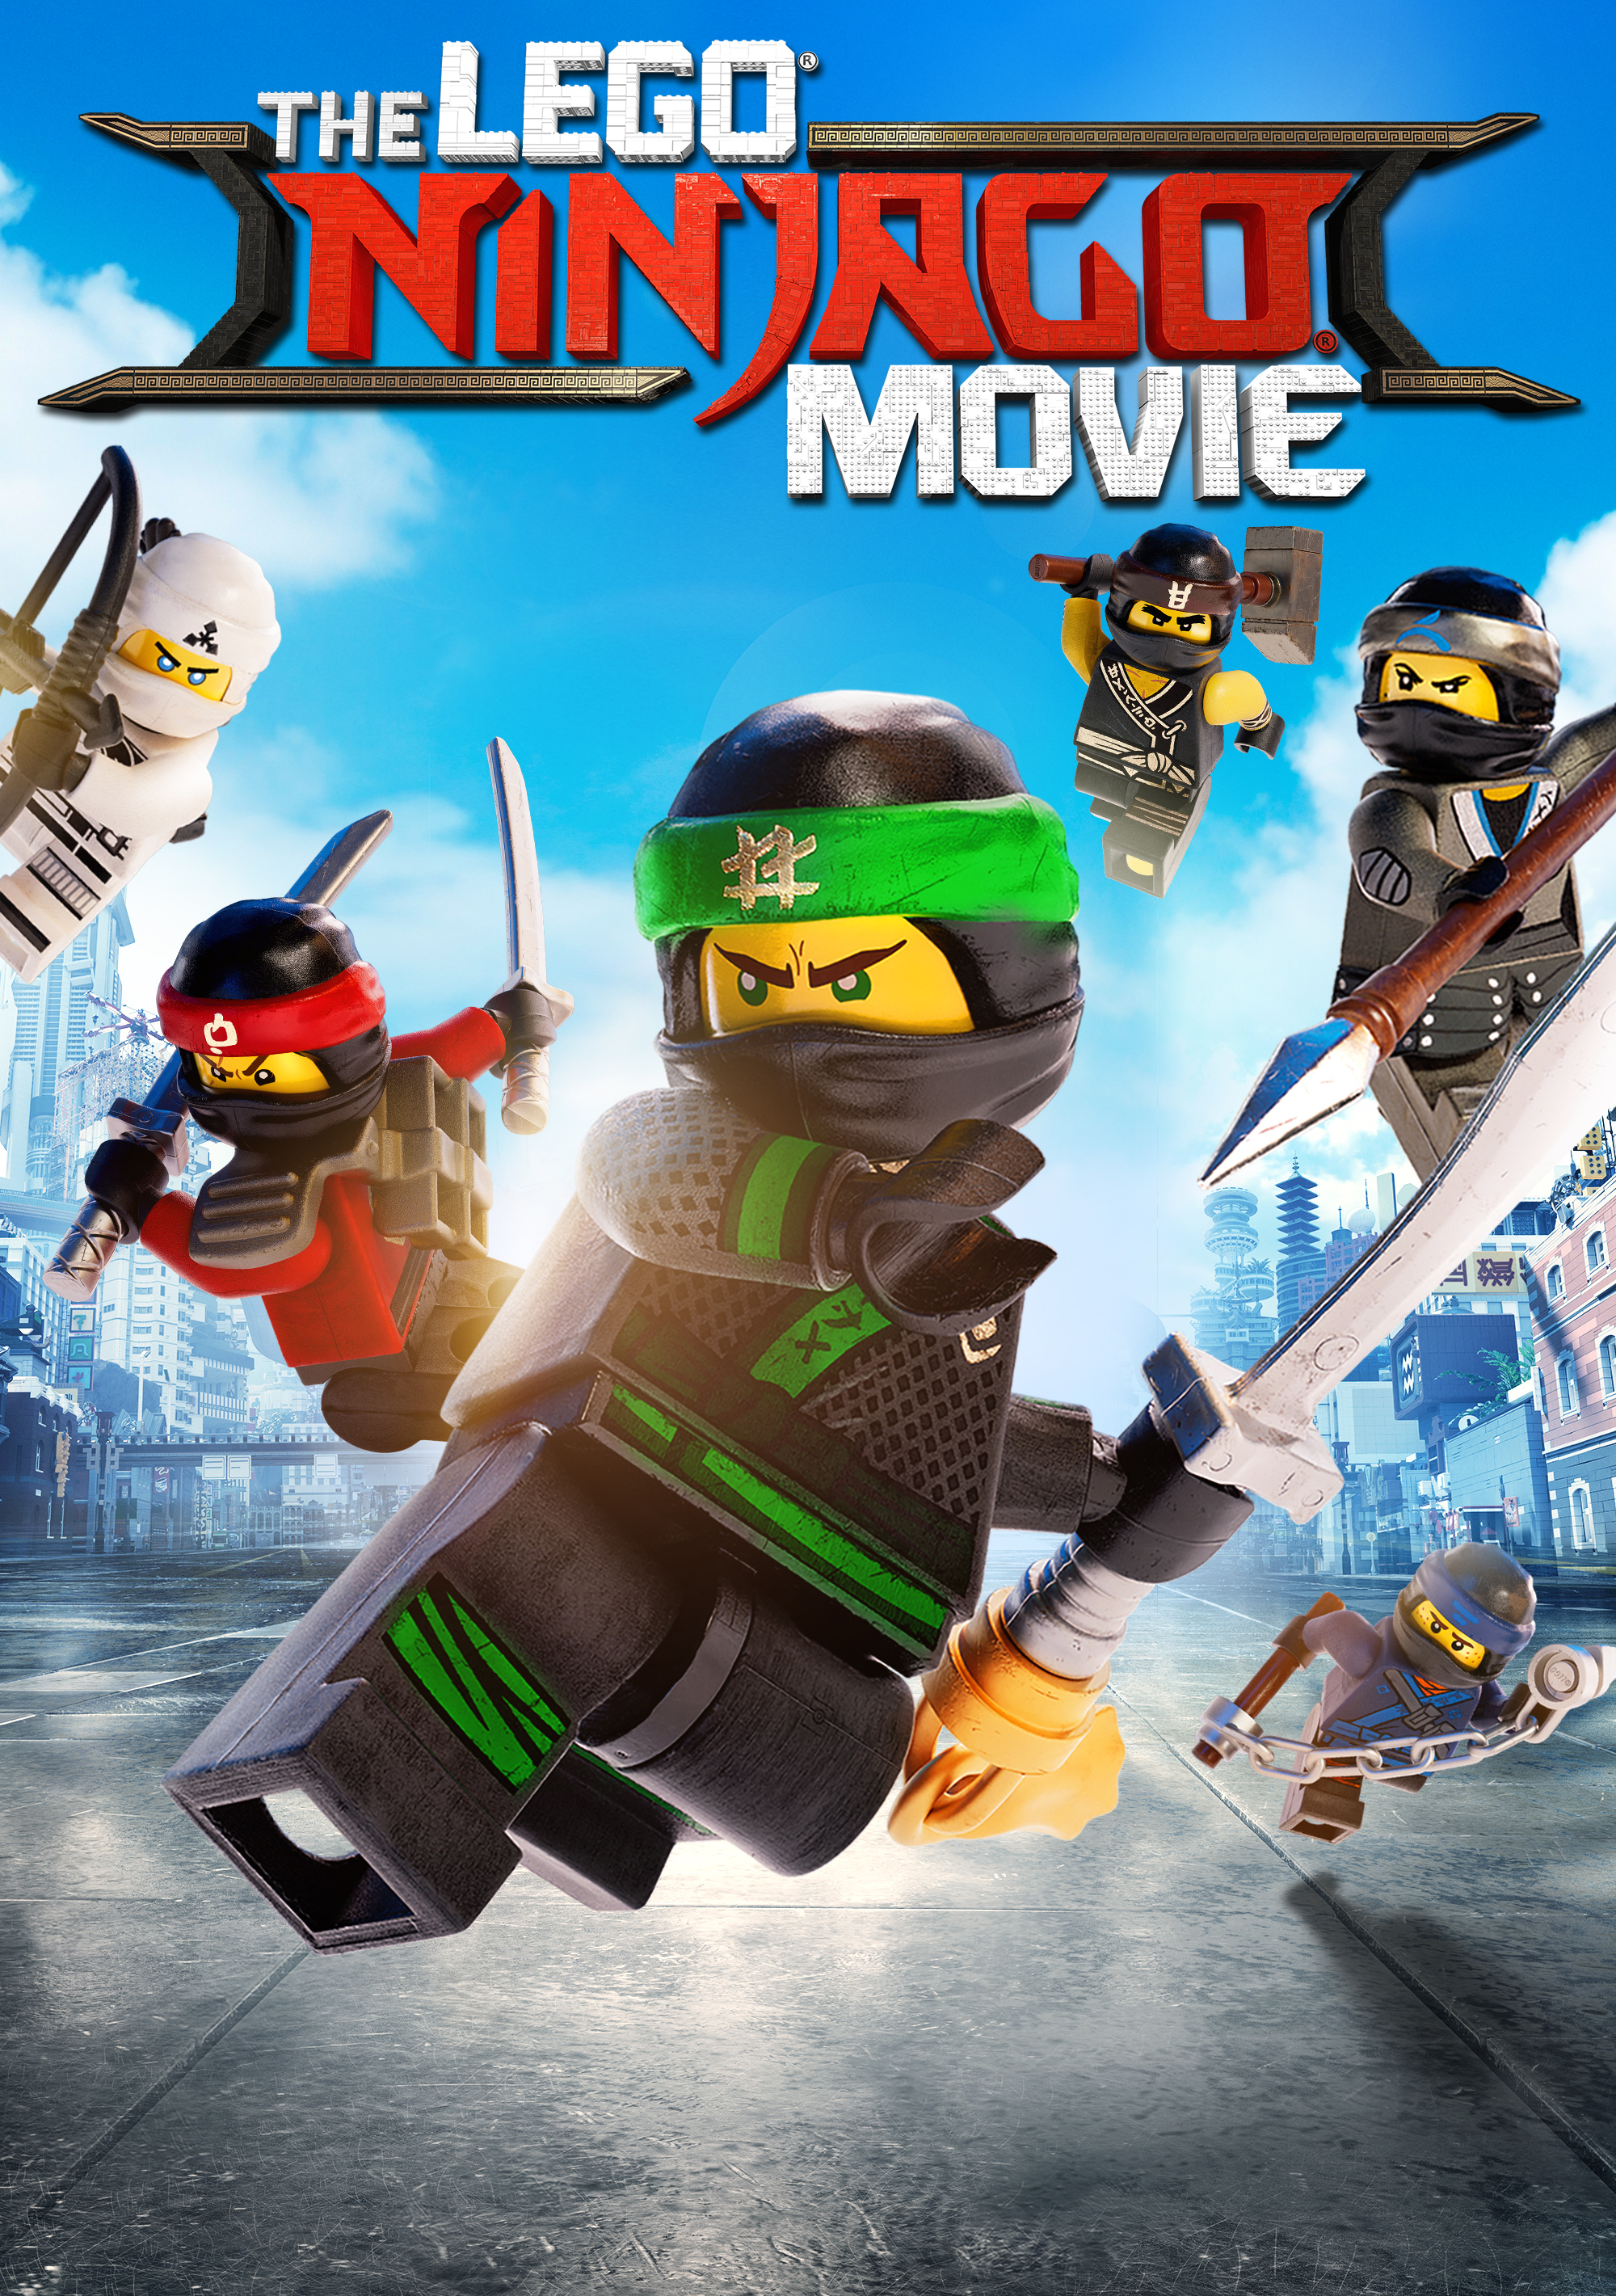 image The LEGO Ninjago Movie Watch Full Movie Free Online